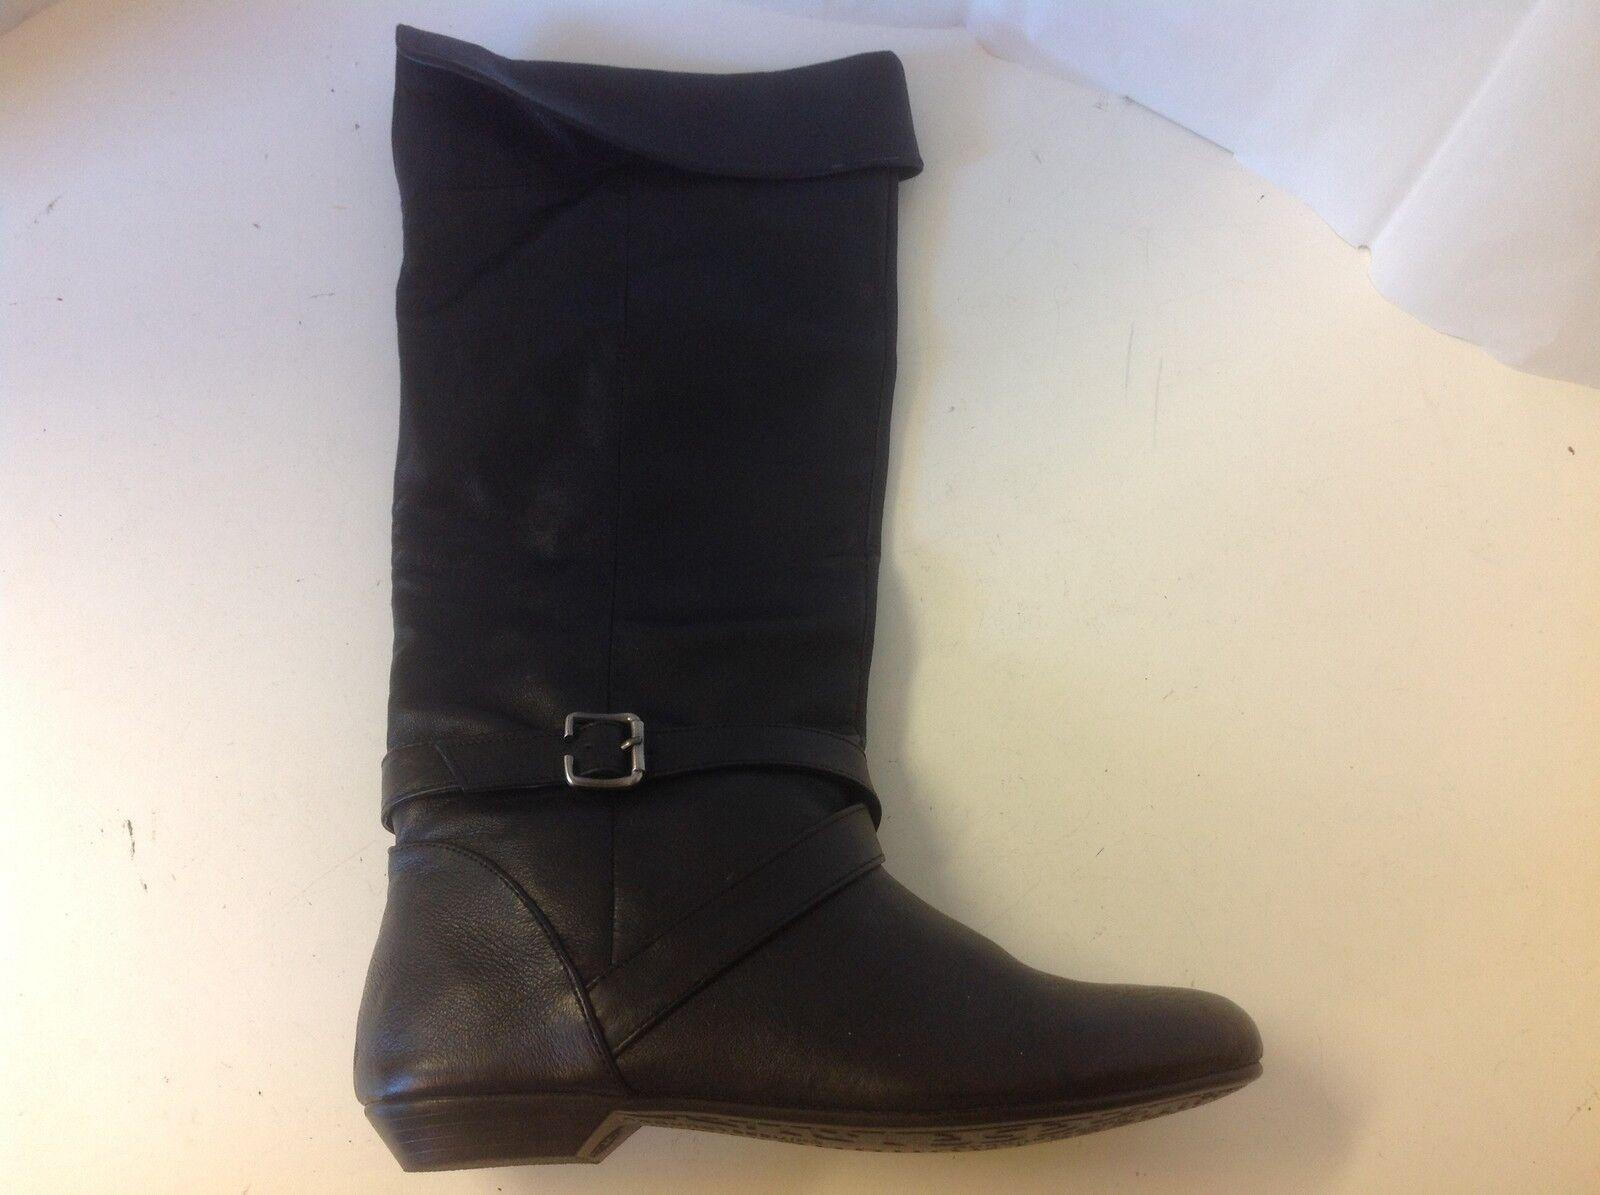 Chinese Laundry Newbie  Boot Black Knee 8  M New Buckle